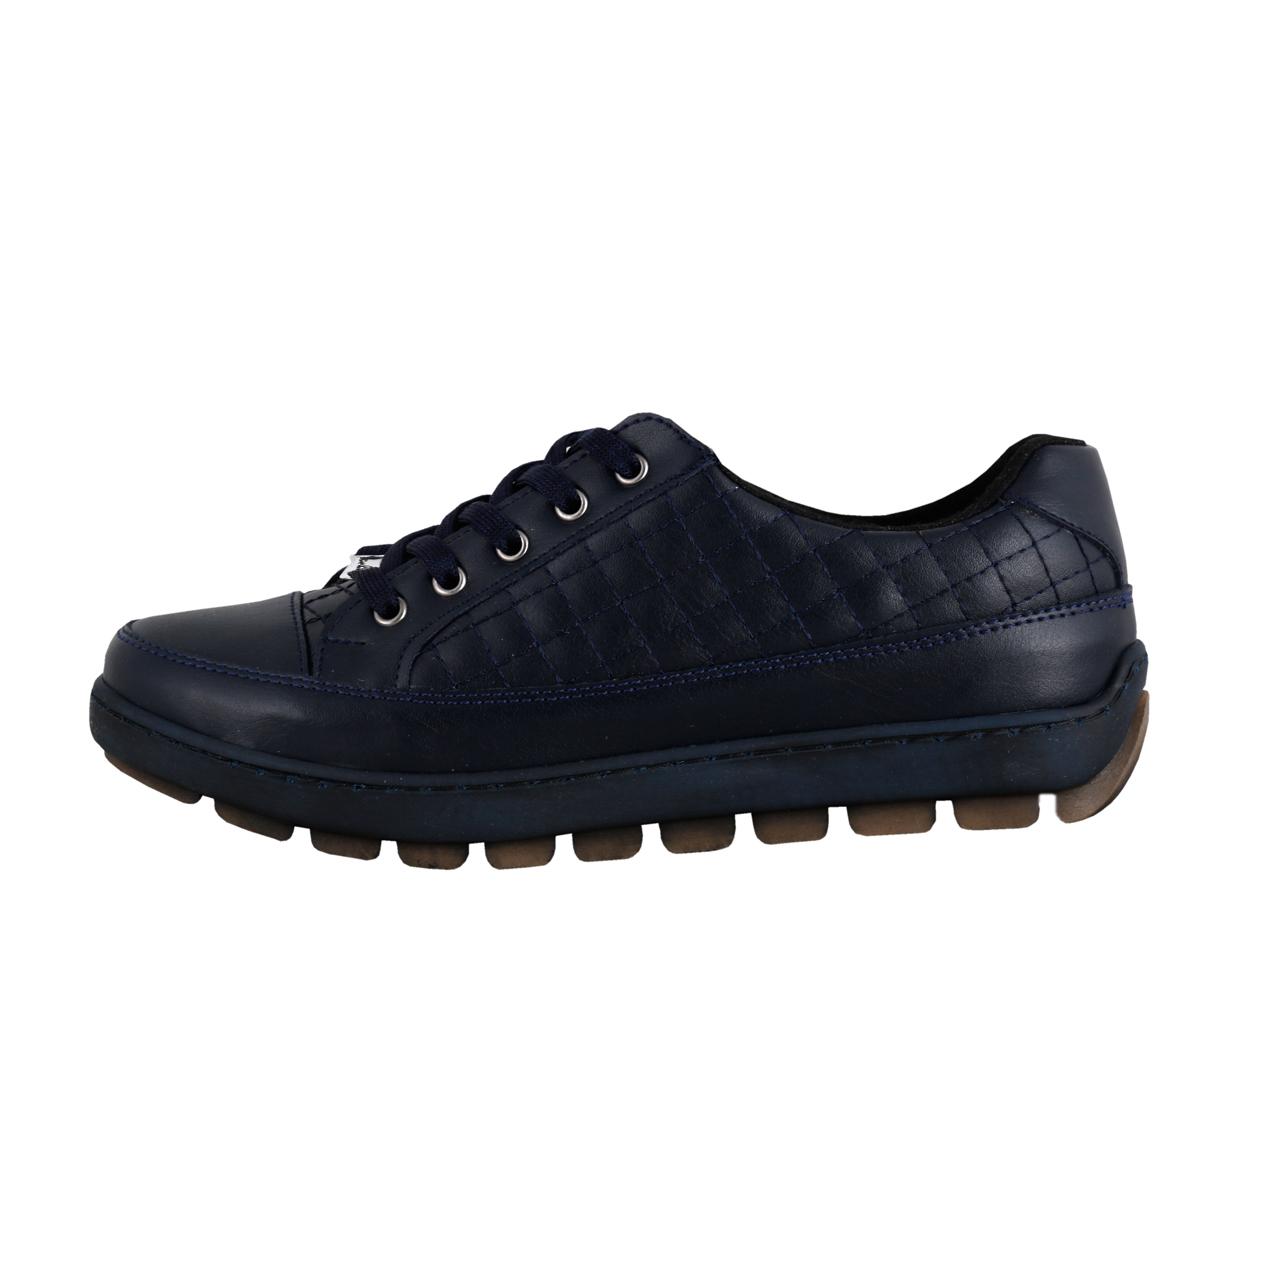 کفش روزمره زنانه بامبی کد k0510010309 bl